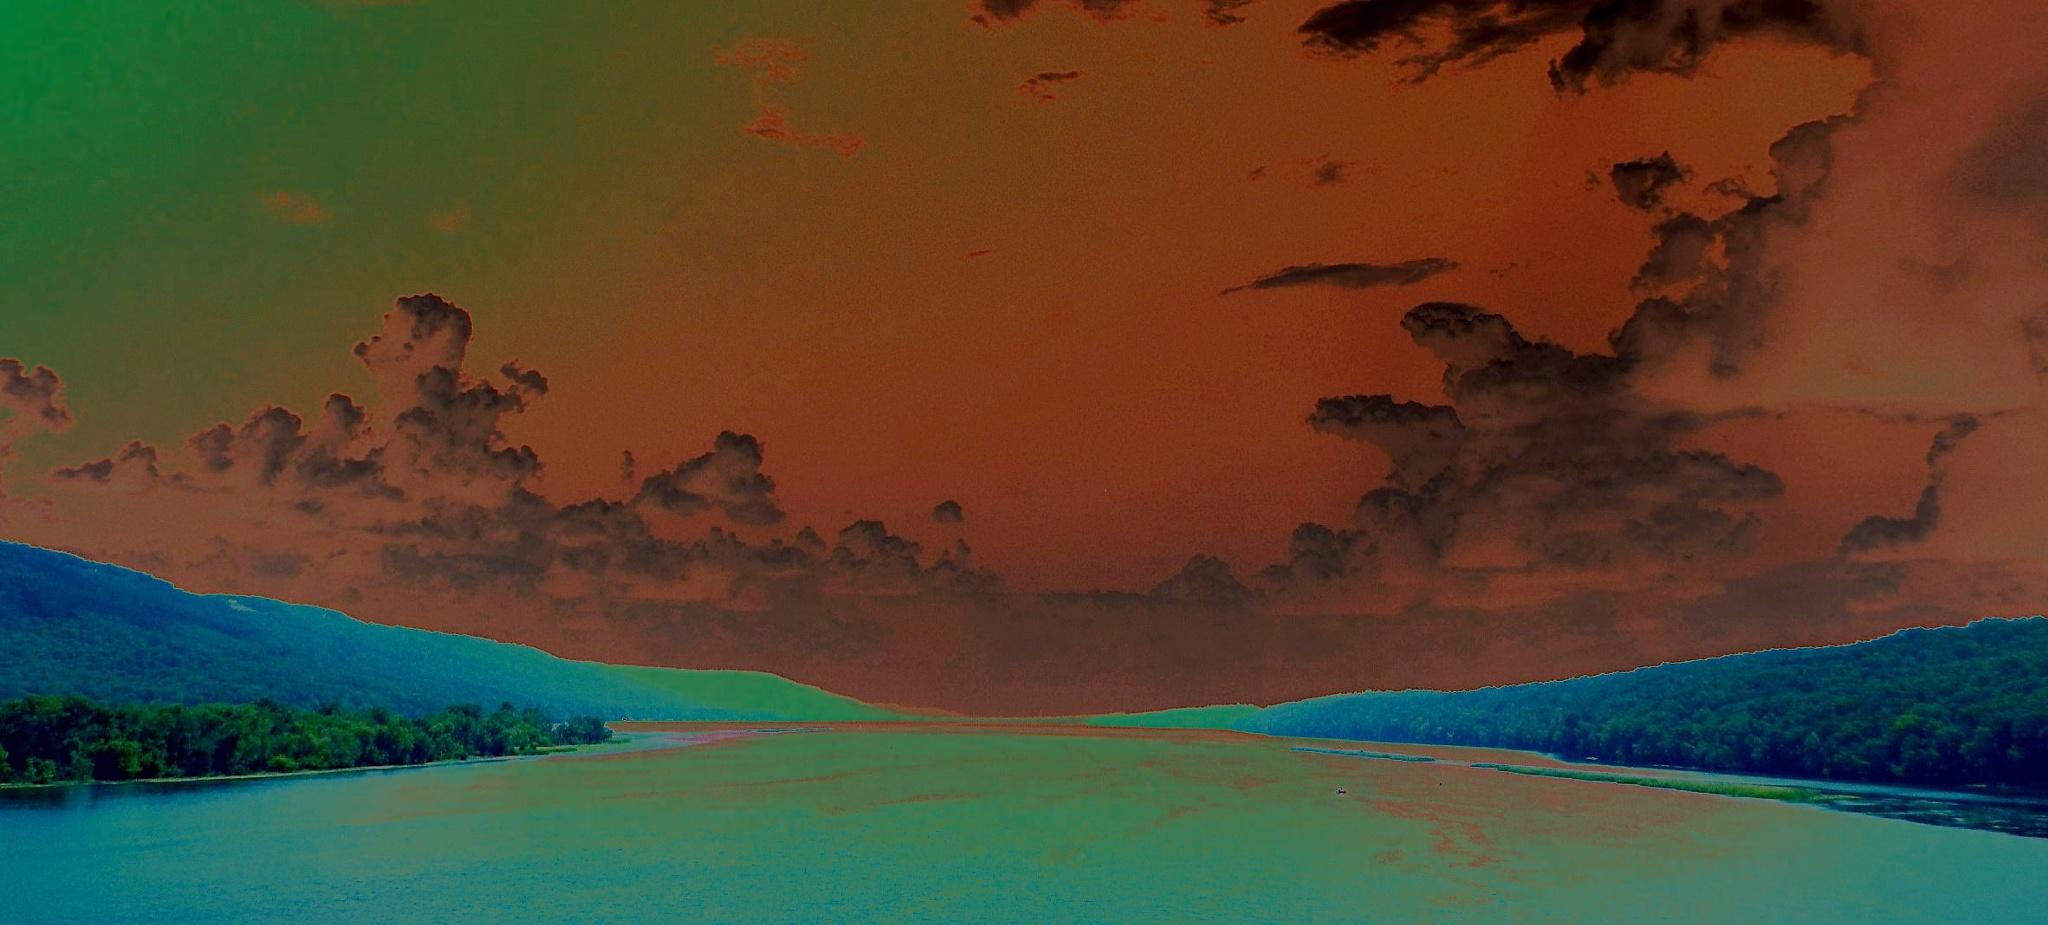 Neon River of Light by Alex Ingram